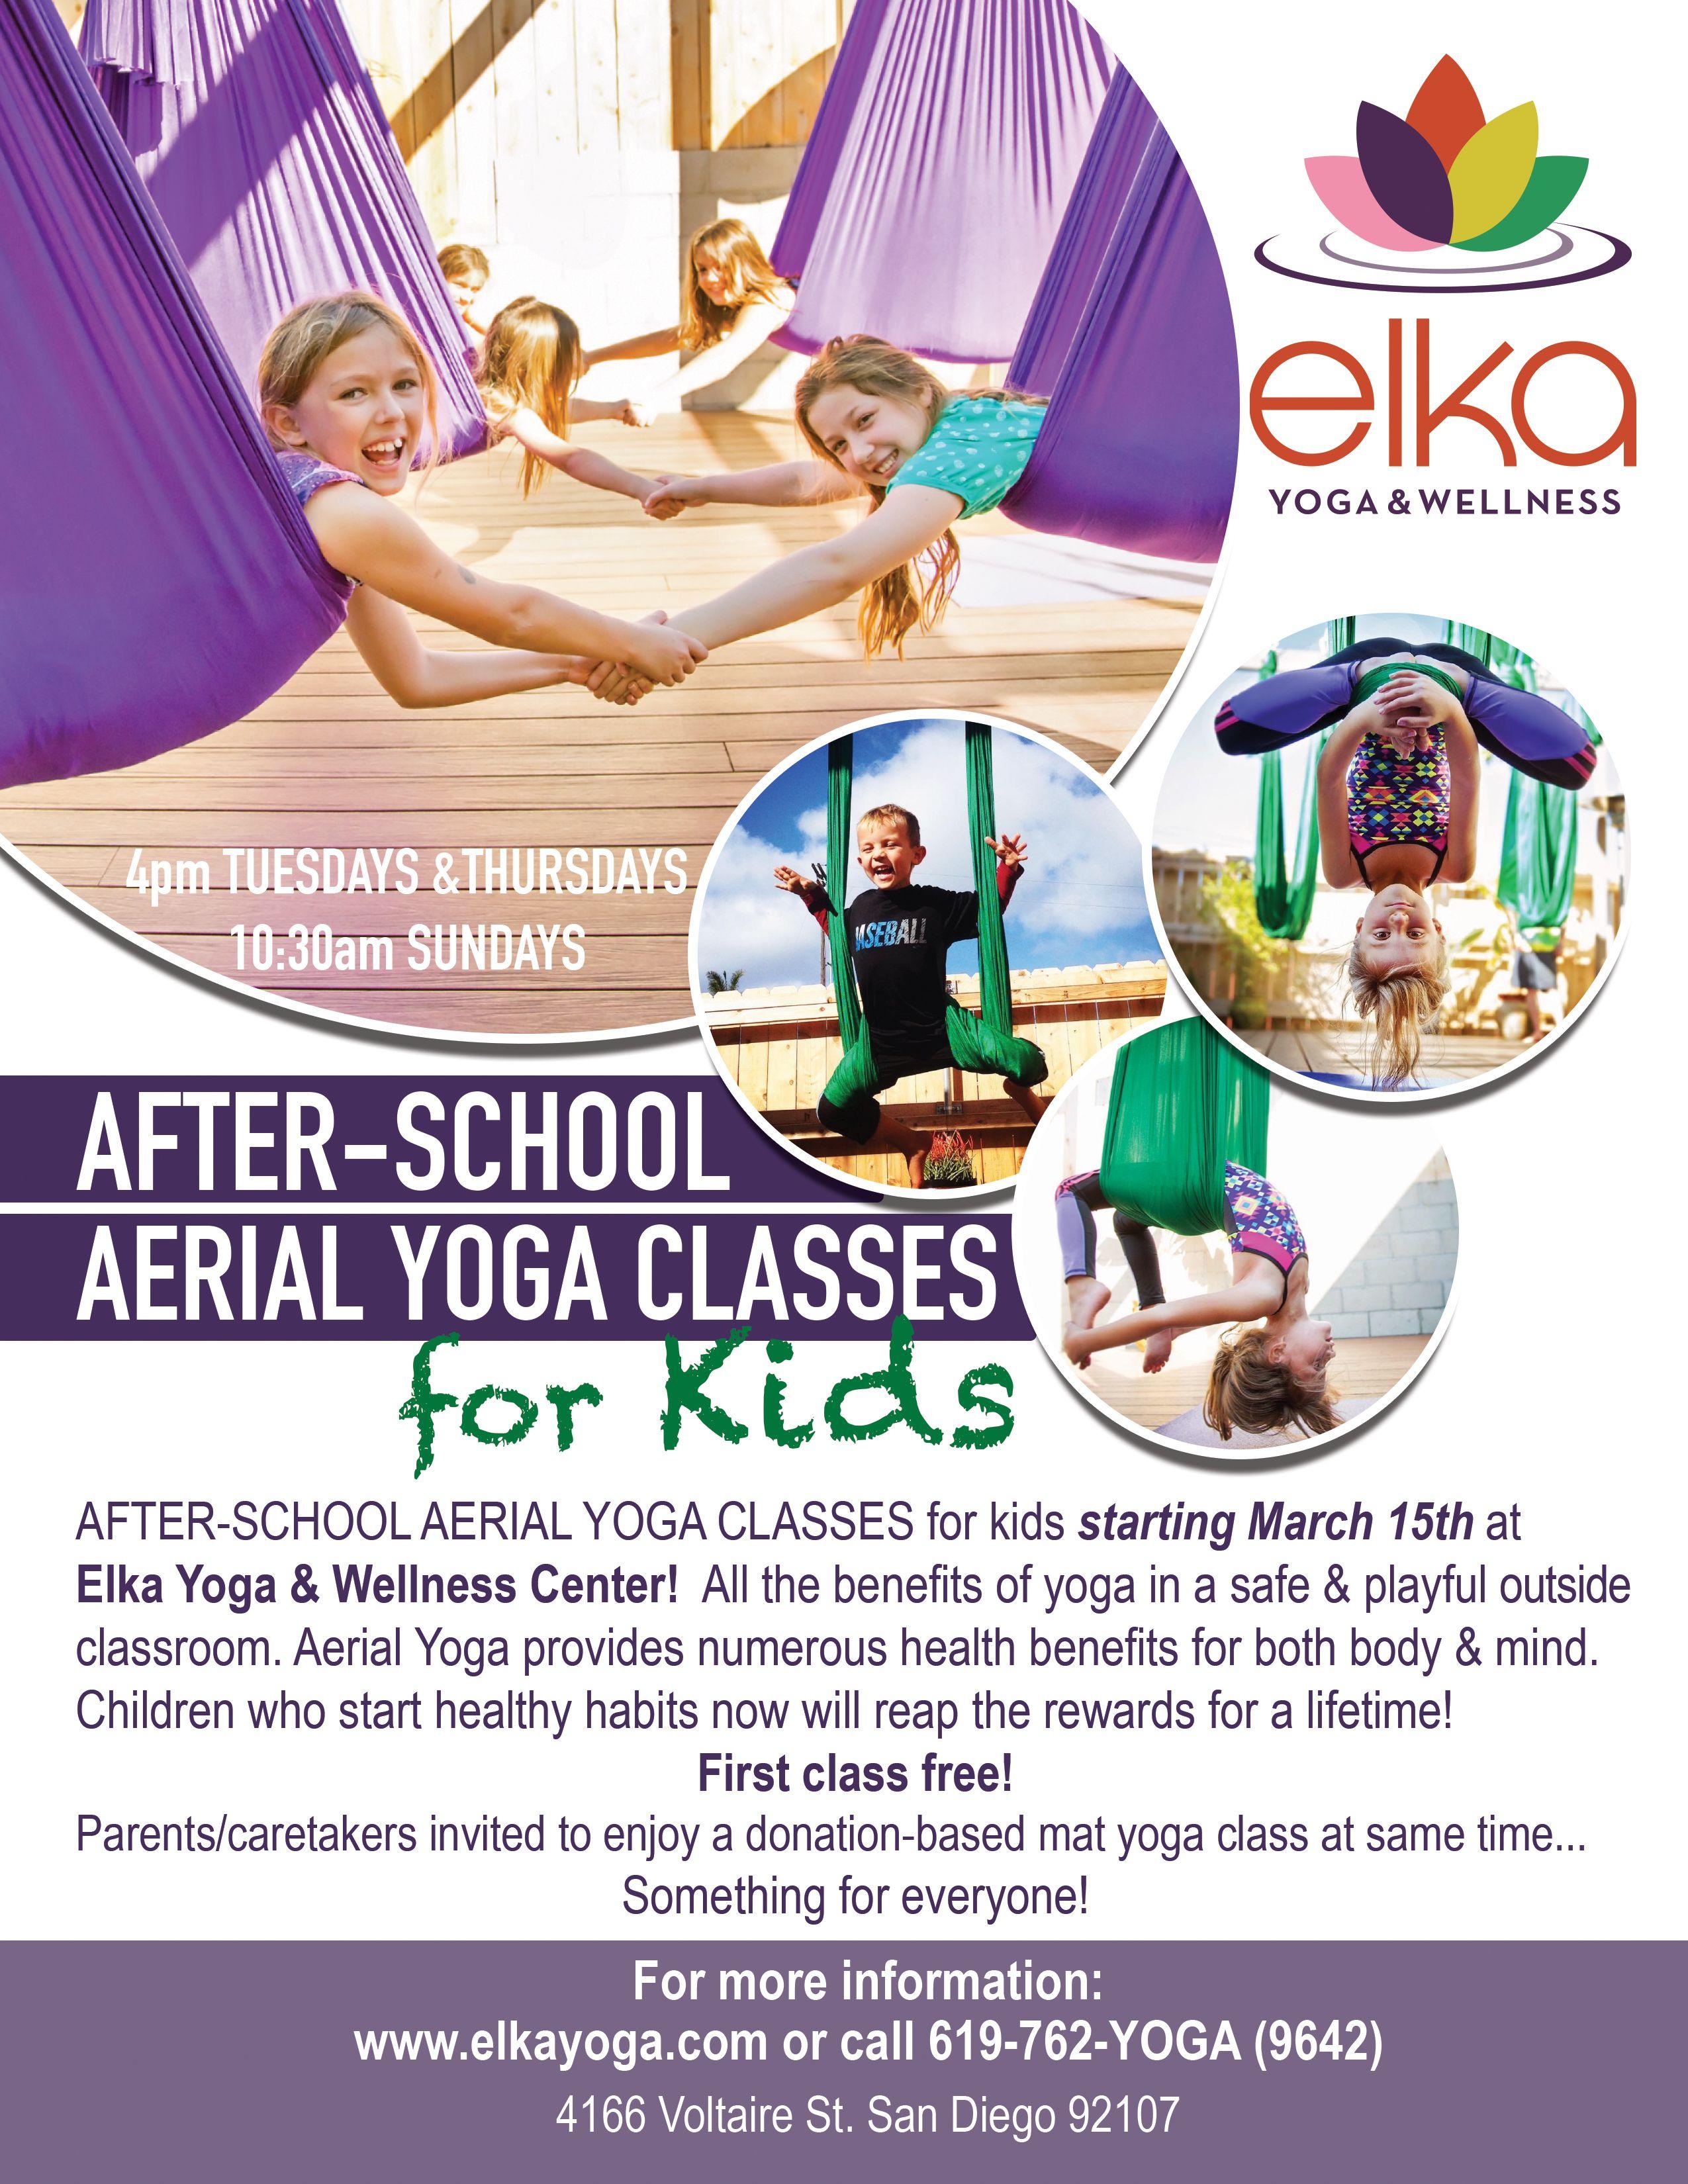 Kids Aerial Yoga Flyer Designed By Camila Badaro Aerial Yoga Kids Flyer Design Graphicdesign Sandiego Ins Yoga Flyer Kids Yoga Classes Yoga For Kids